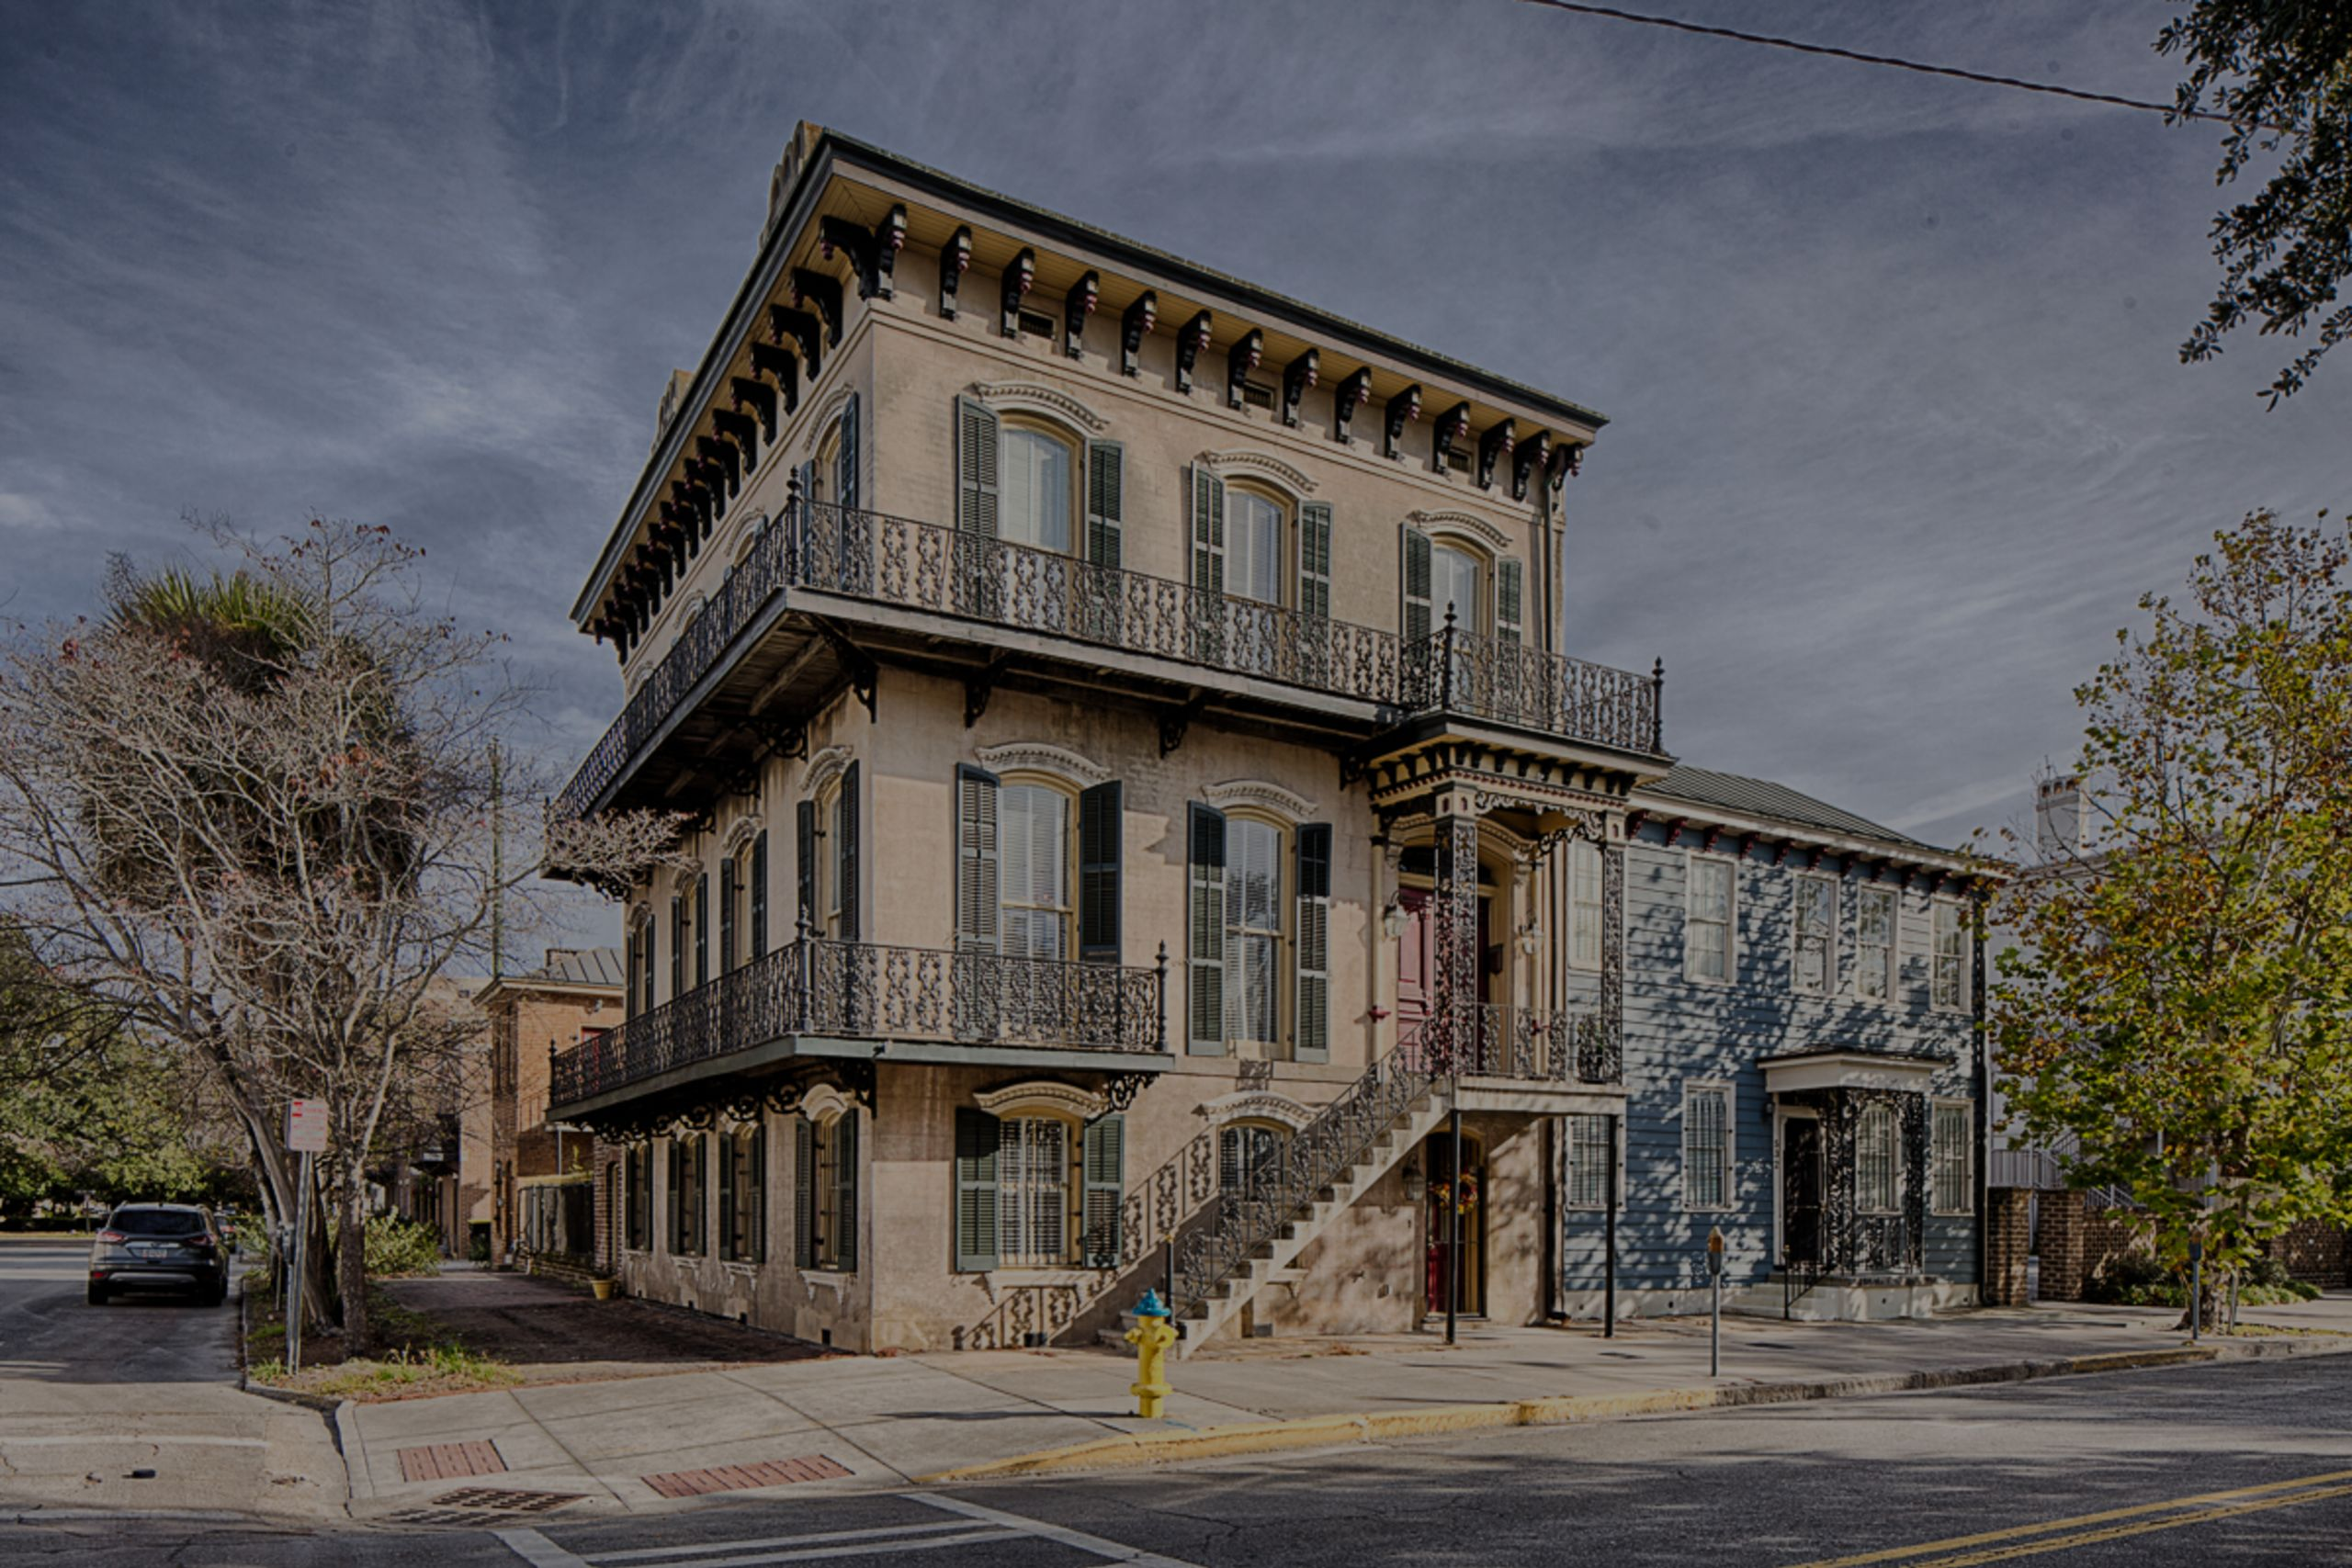 Architectural Gem on Broughton Street